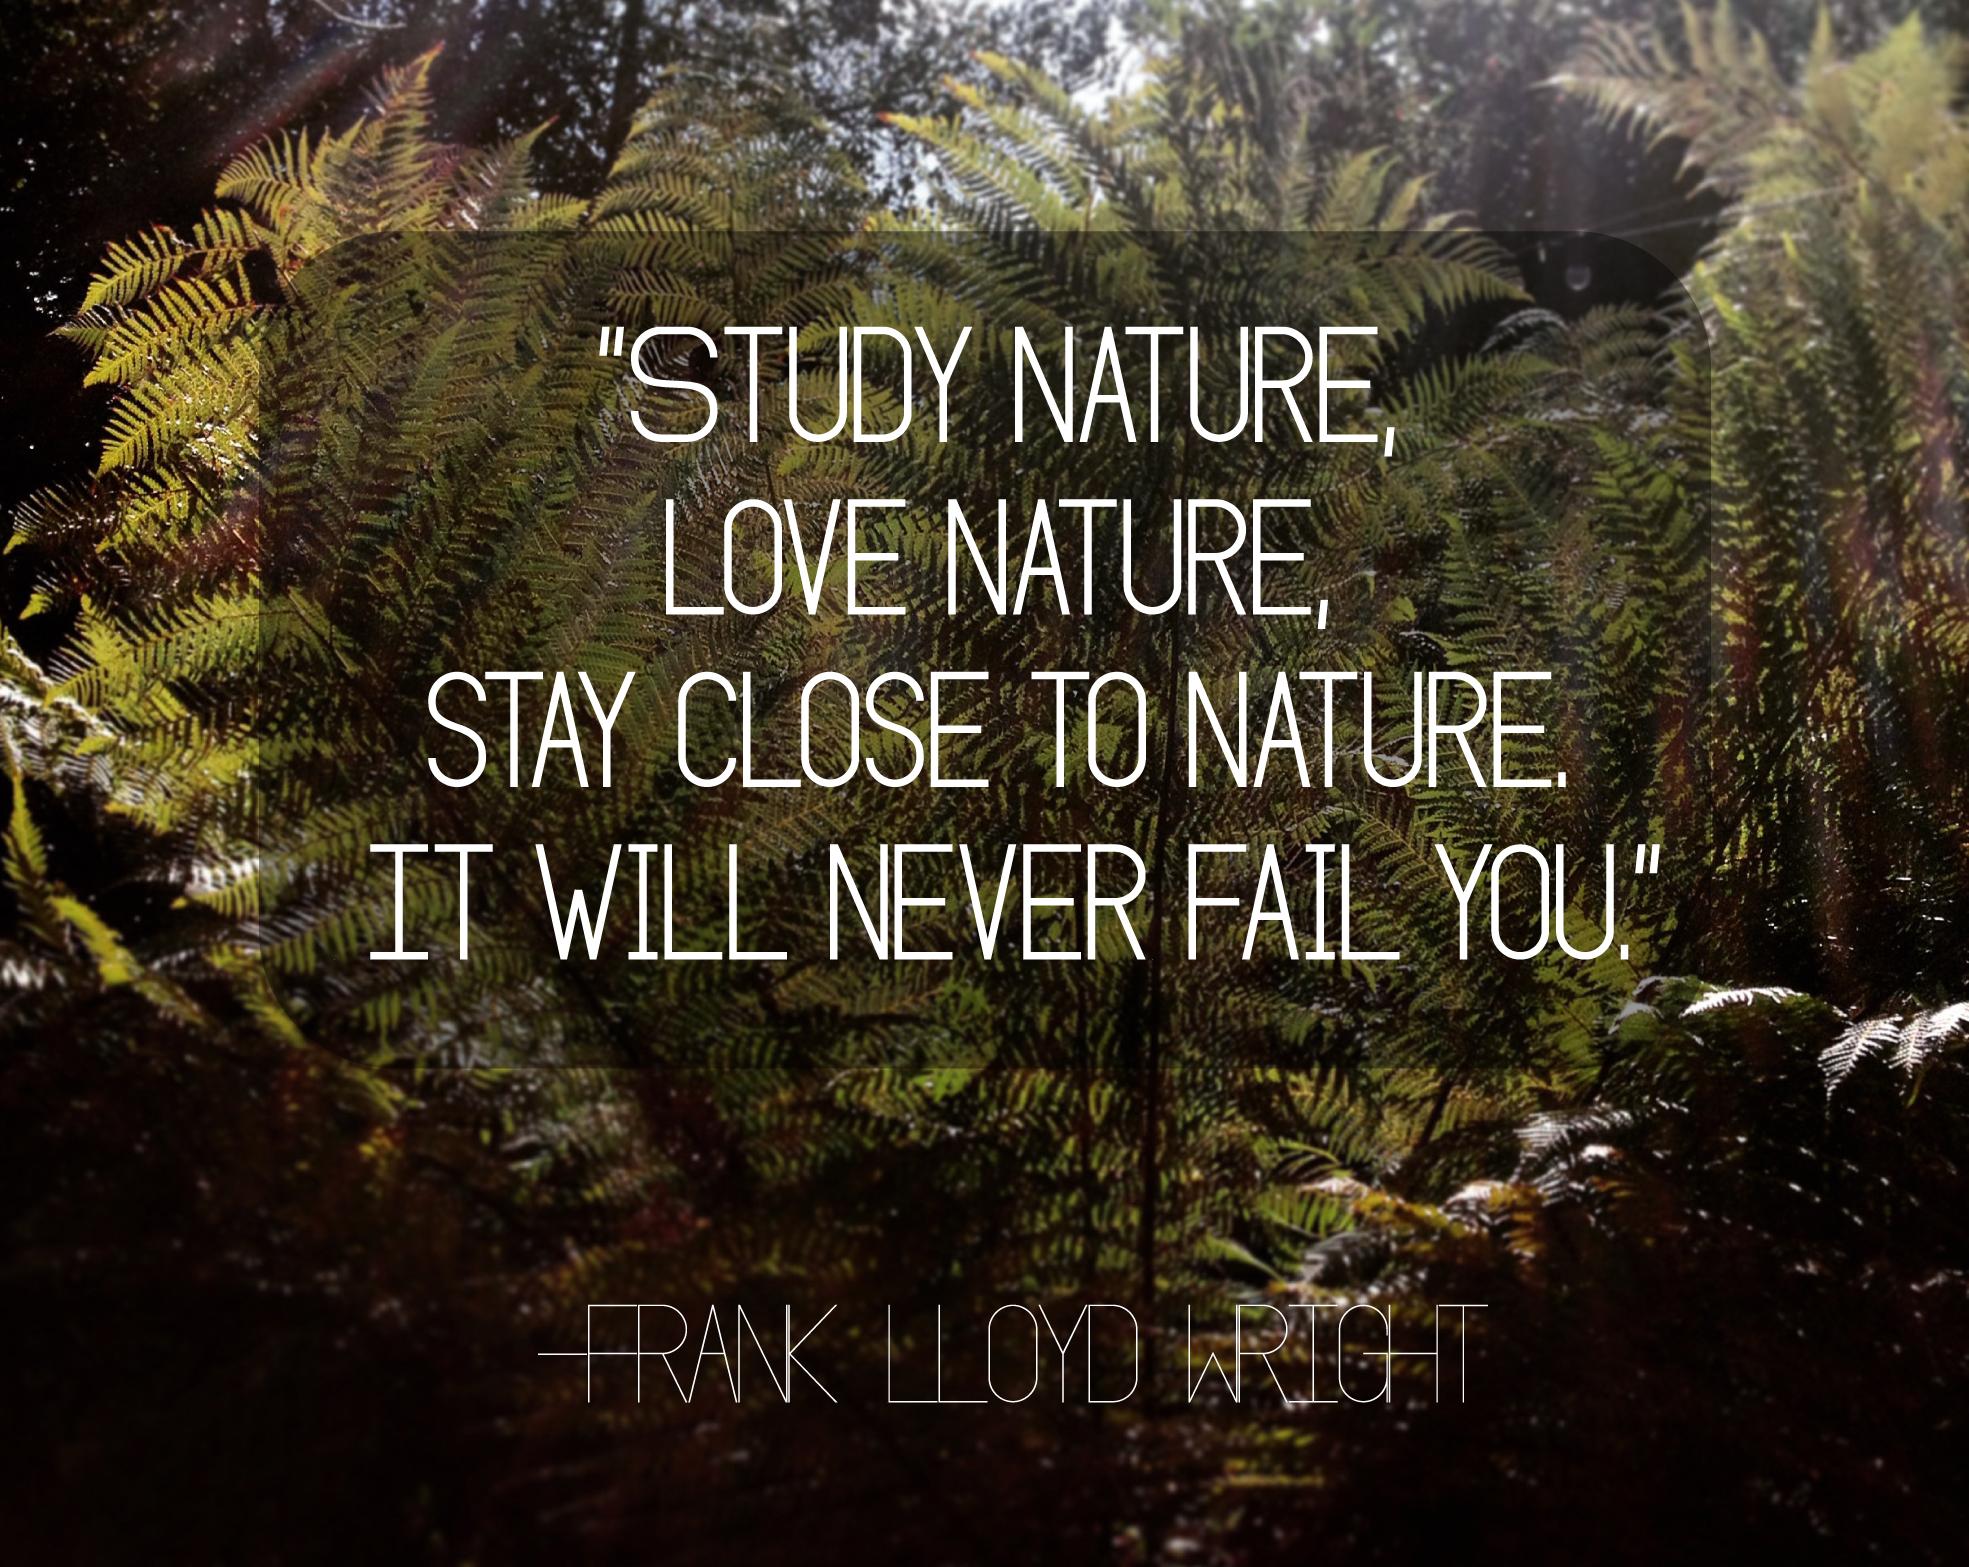 studynature.jpg